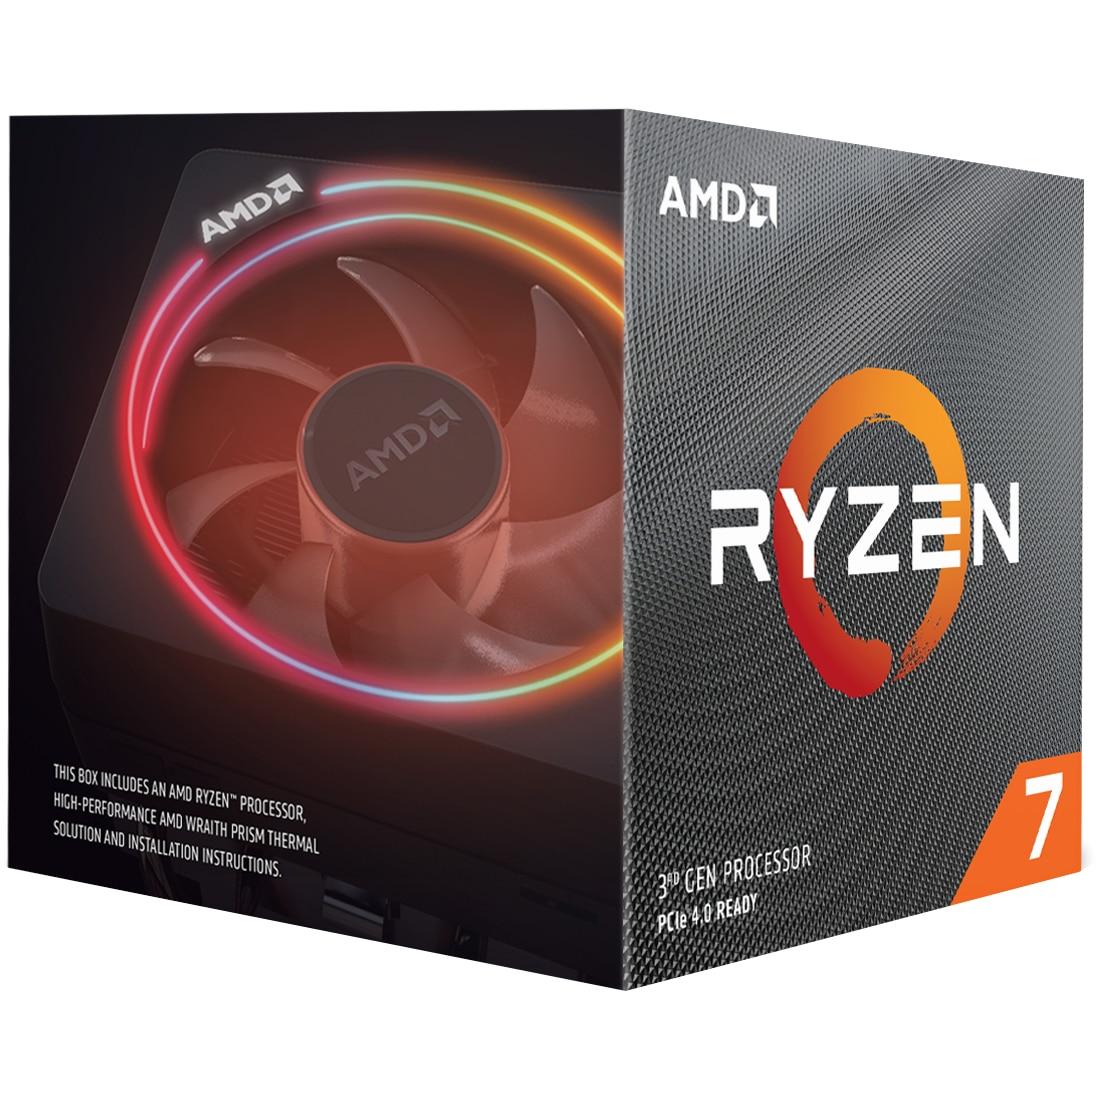 Fotografie Procesor AMD Ryzen™ 7 3800X, 36MB, 4.5 GHz cu Wraith Prism cooler